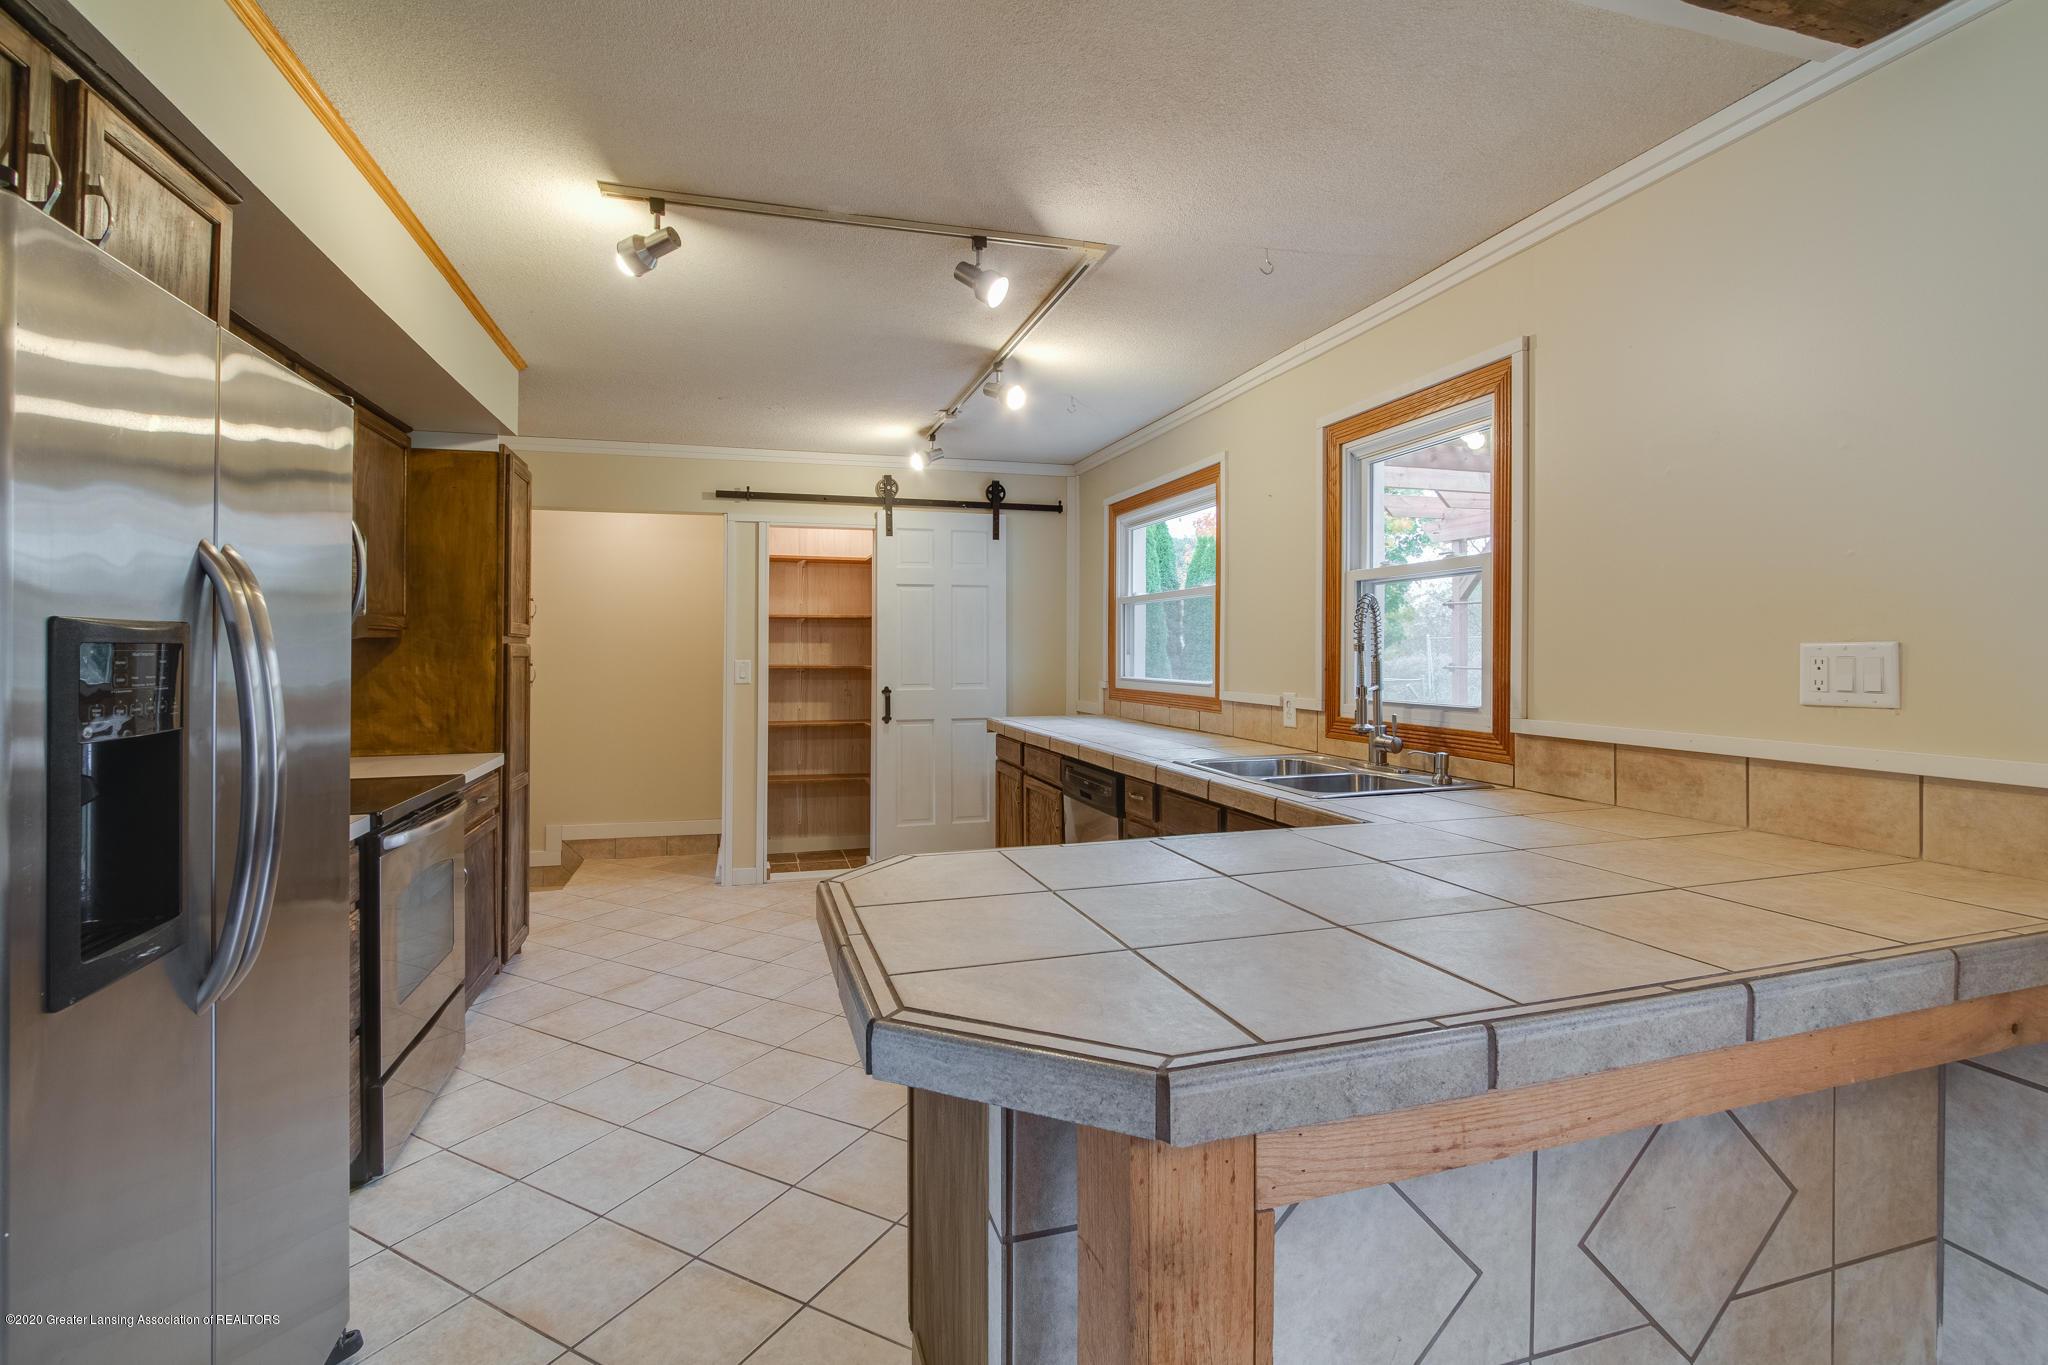 1360 Battle Creek Rd - Kitchen 1 - 11